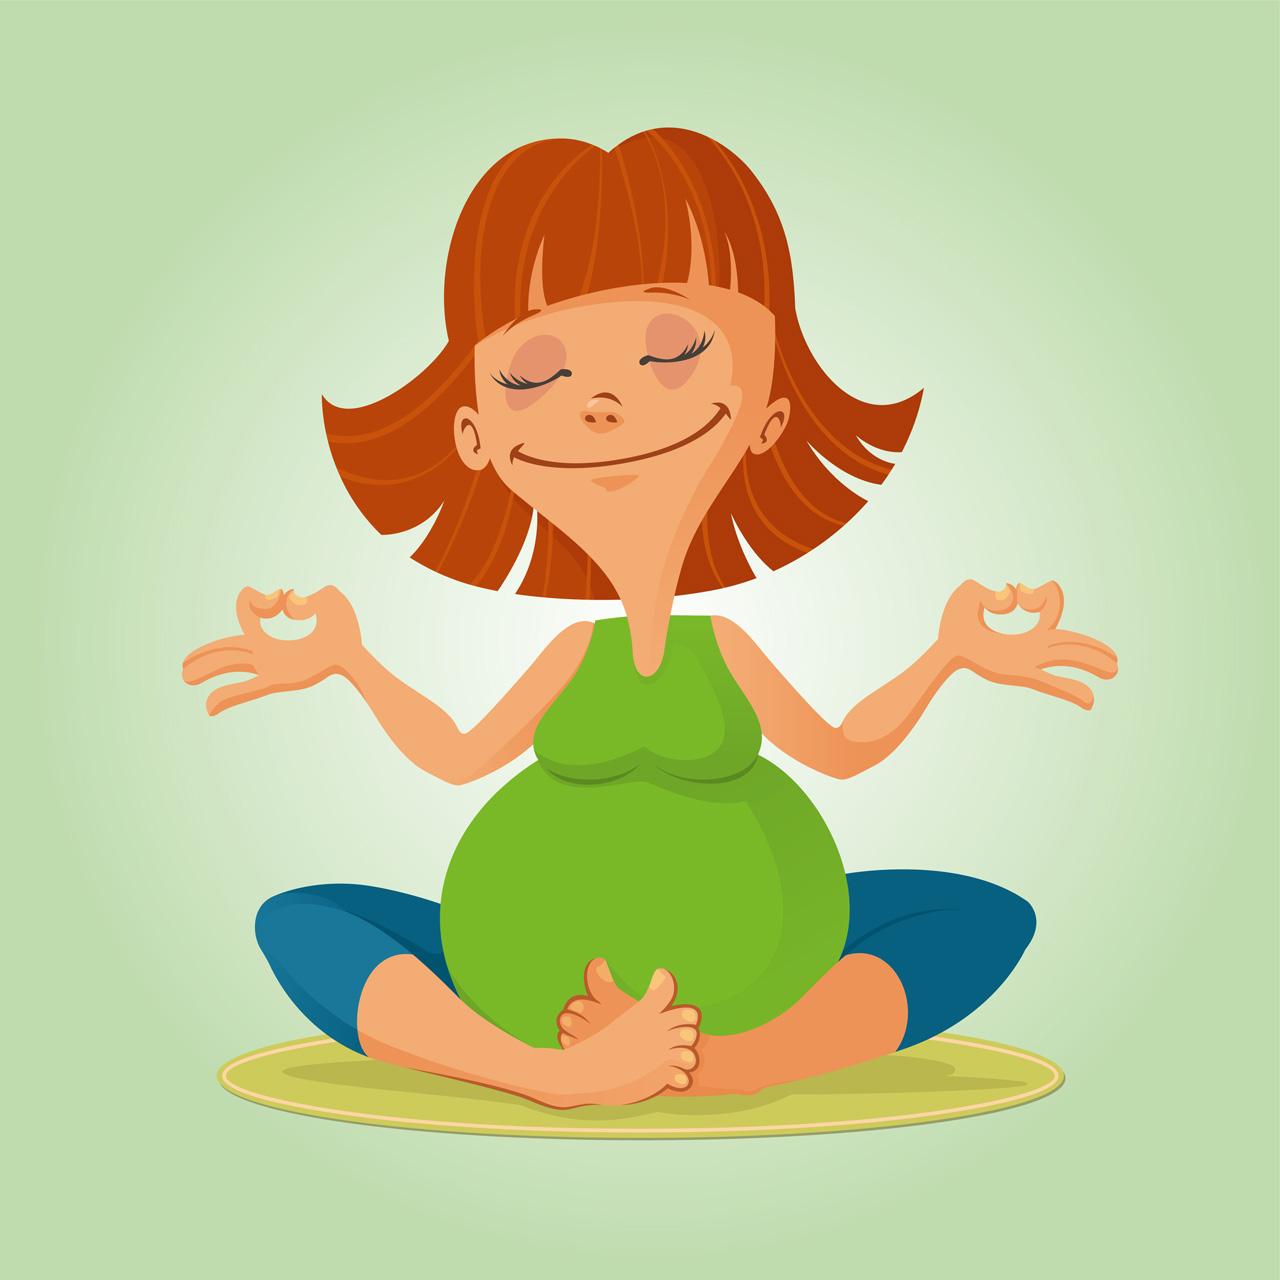 meditazione, yoga, meditation, mindfulness, zen, buddhismo, benessere, salute